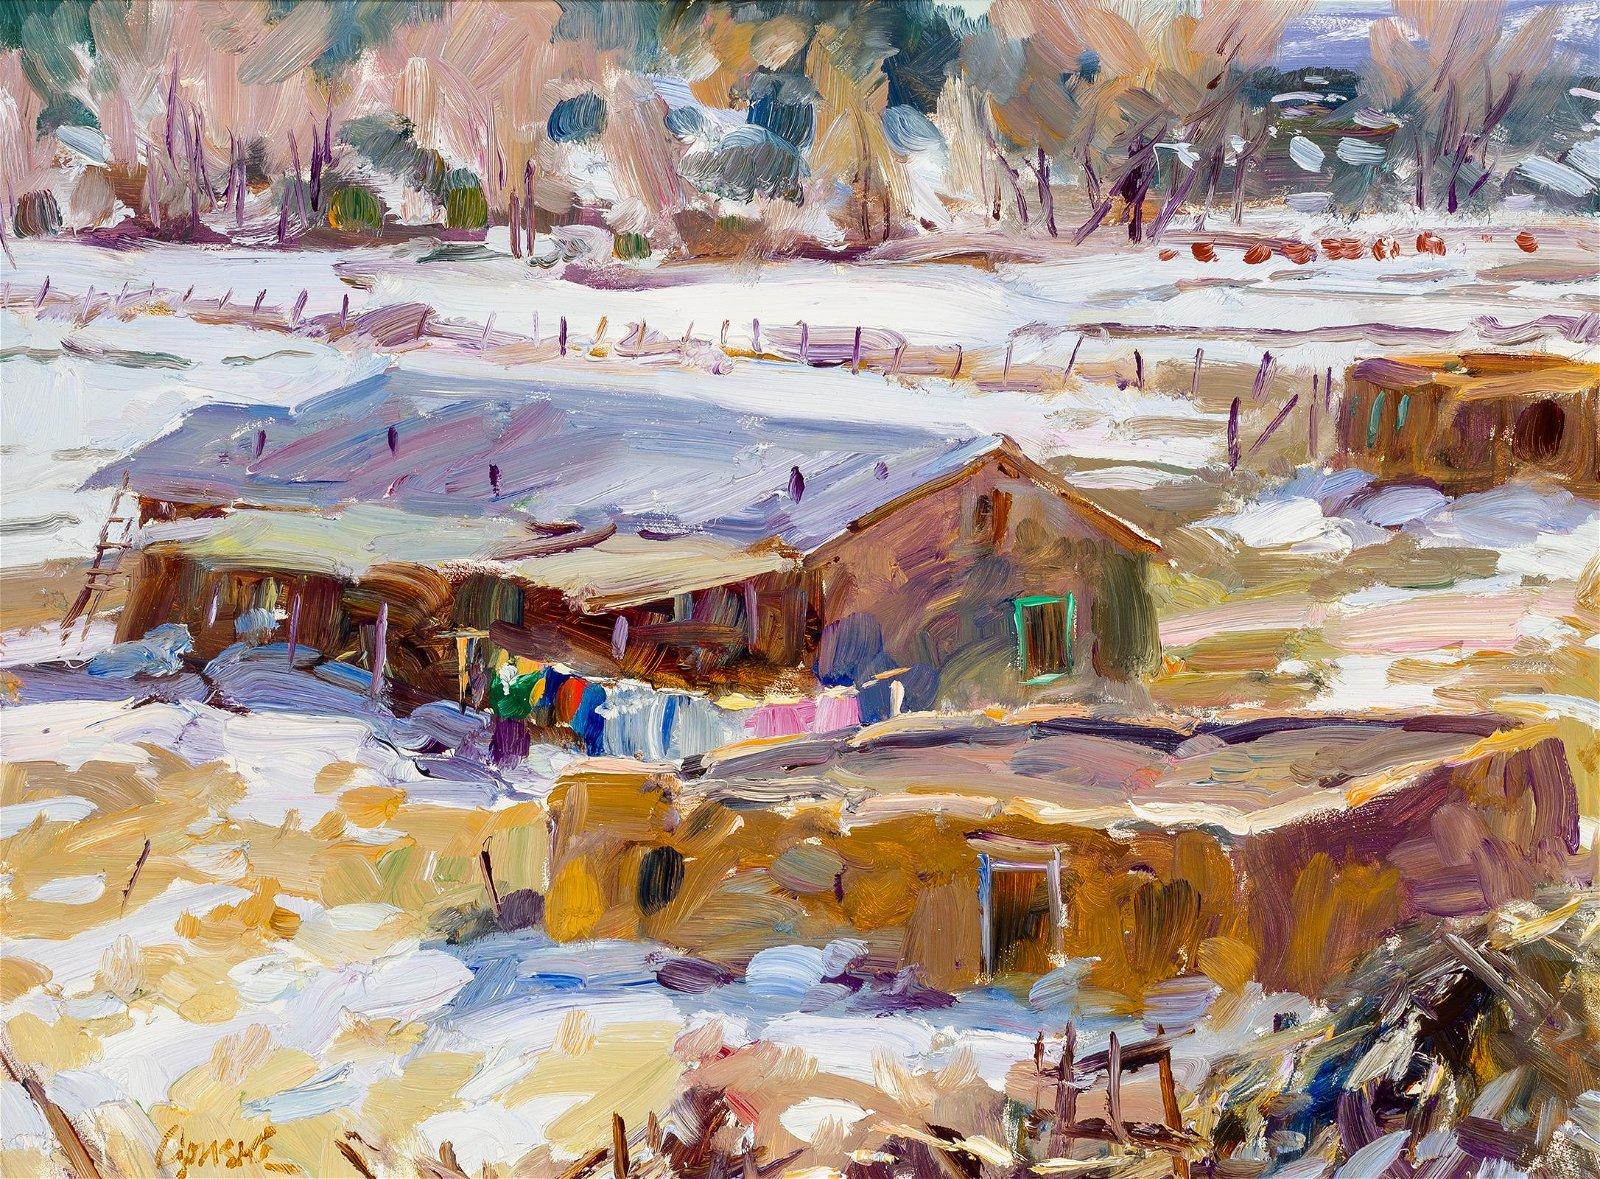 Walter Gonske | Wash Day at La Puente, New Mexico